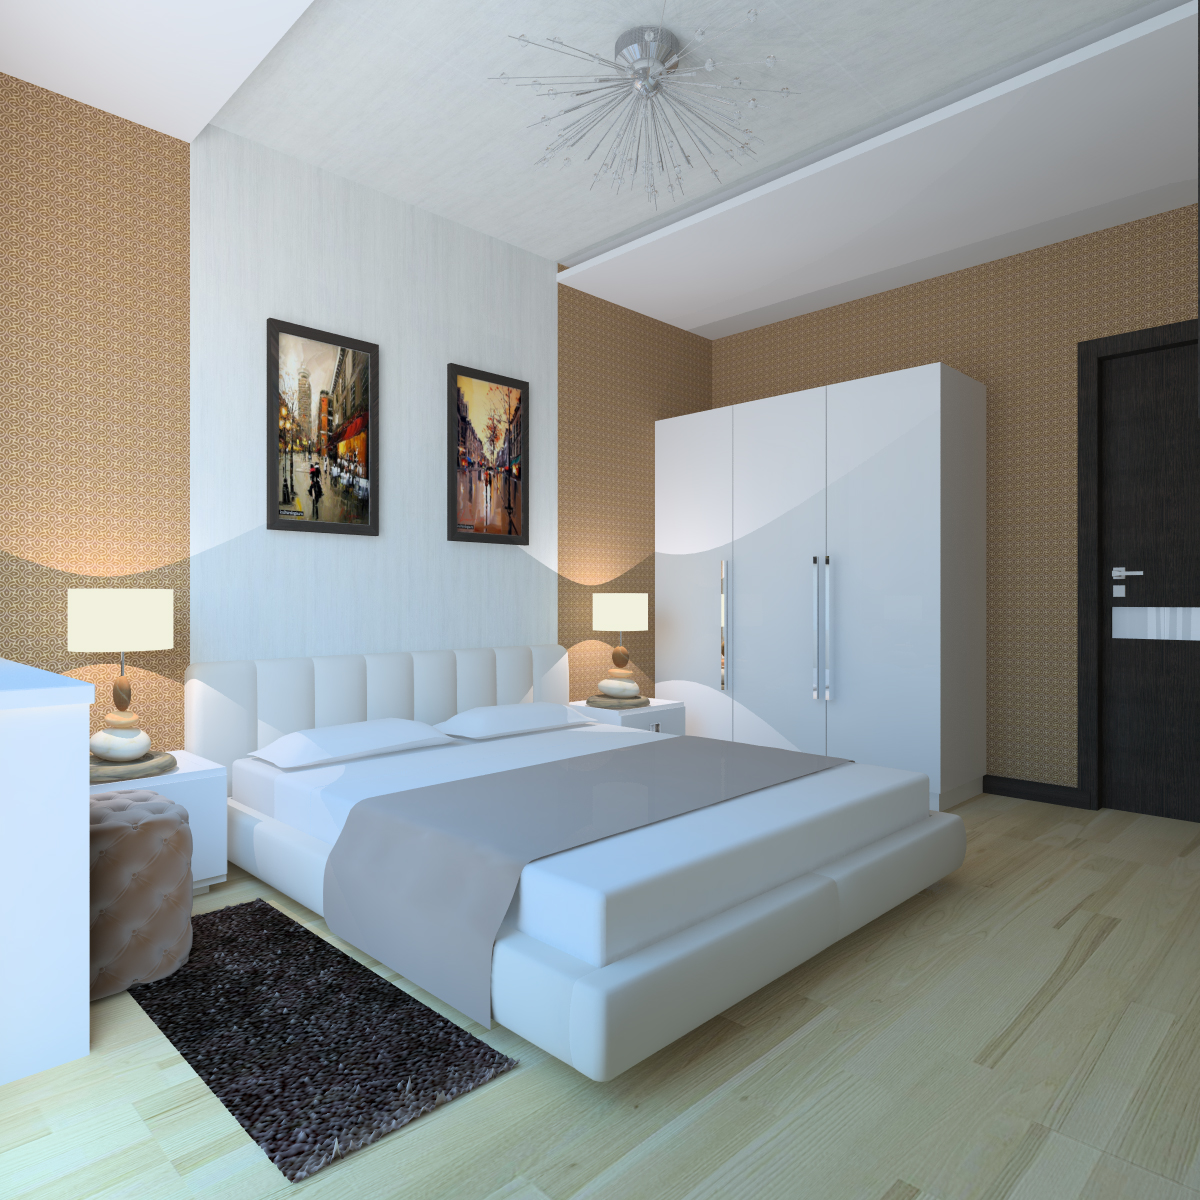 Бело-бежевая спальня в стиле модерн